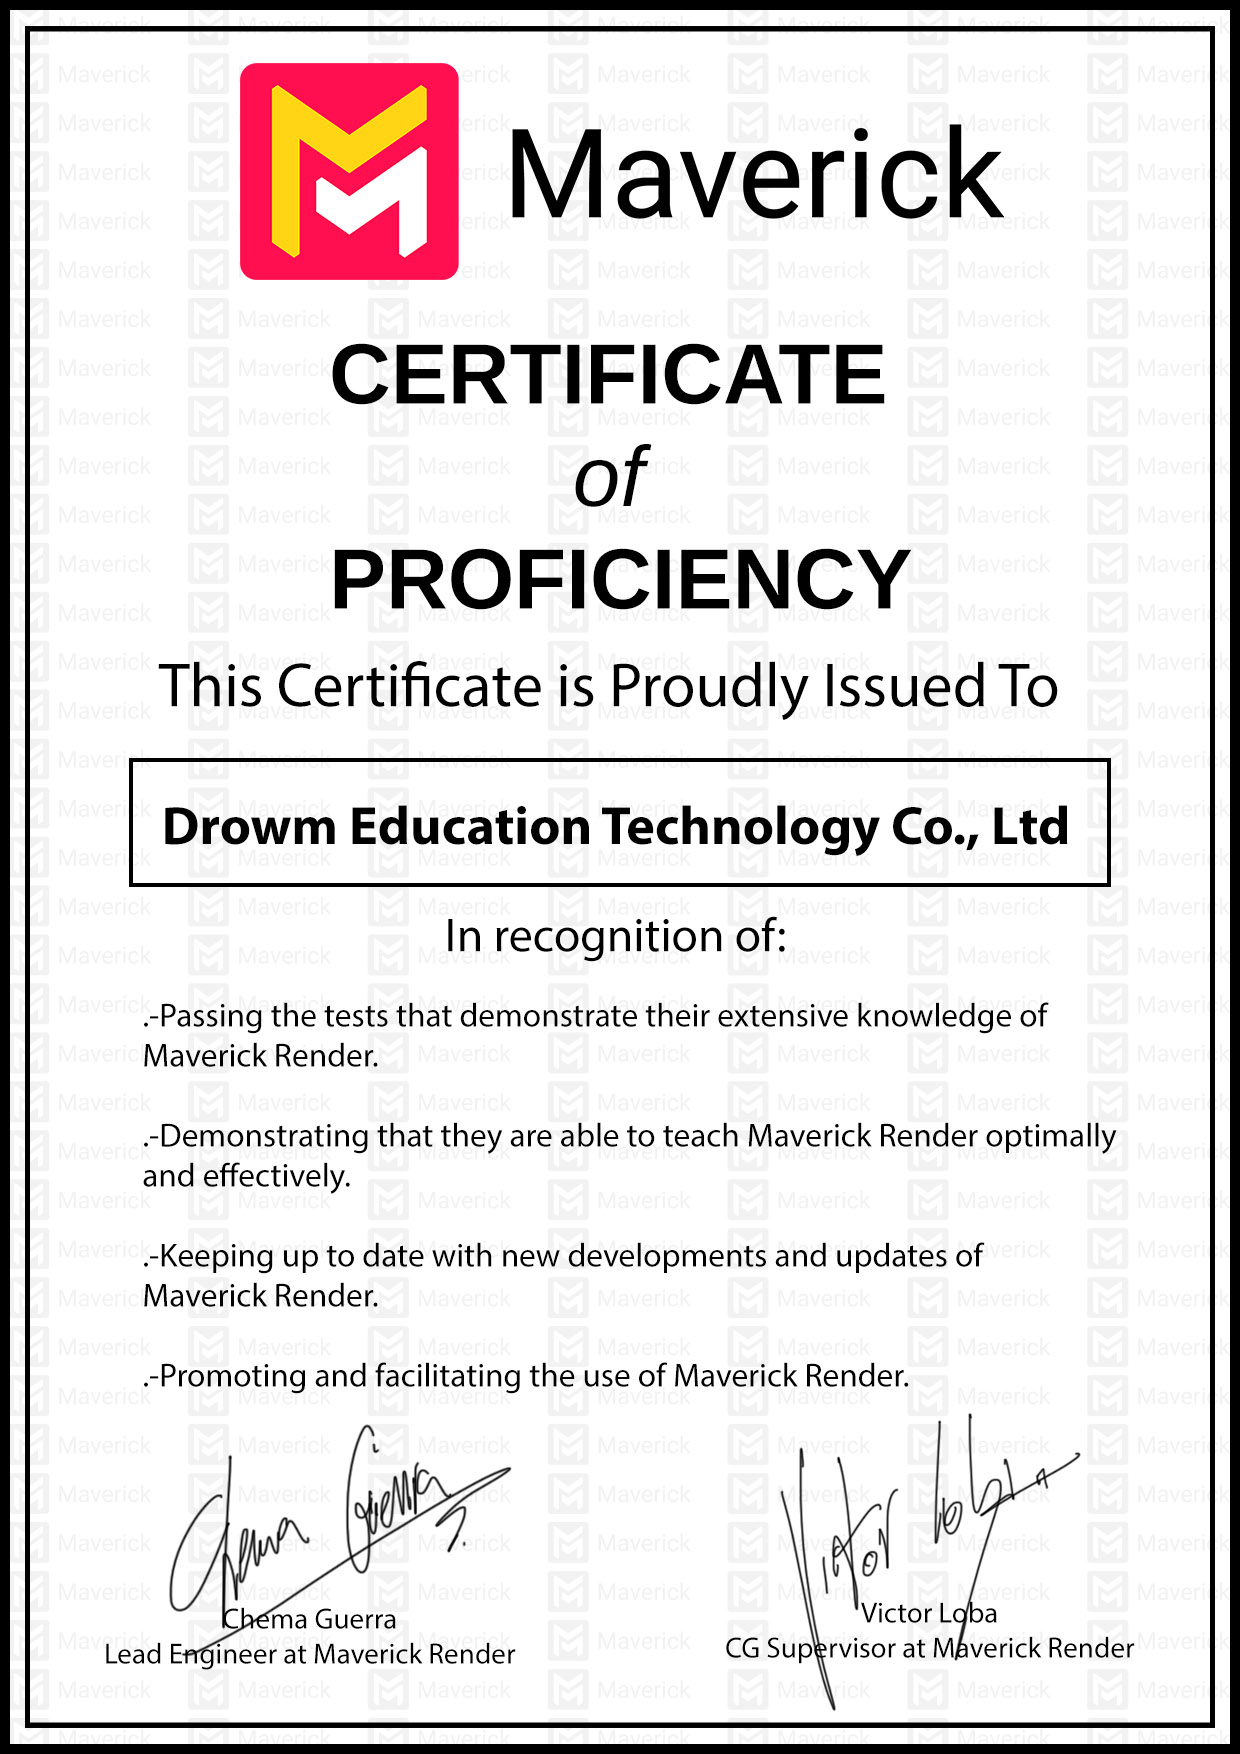 maverickrender-certificate-of-proficiency-drowm